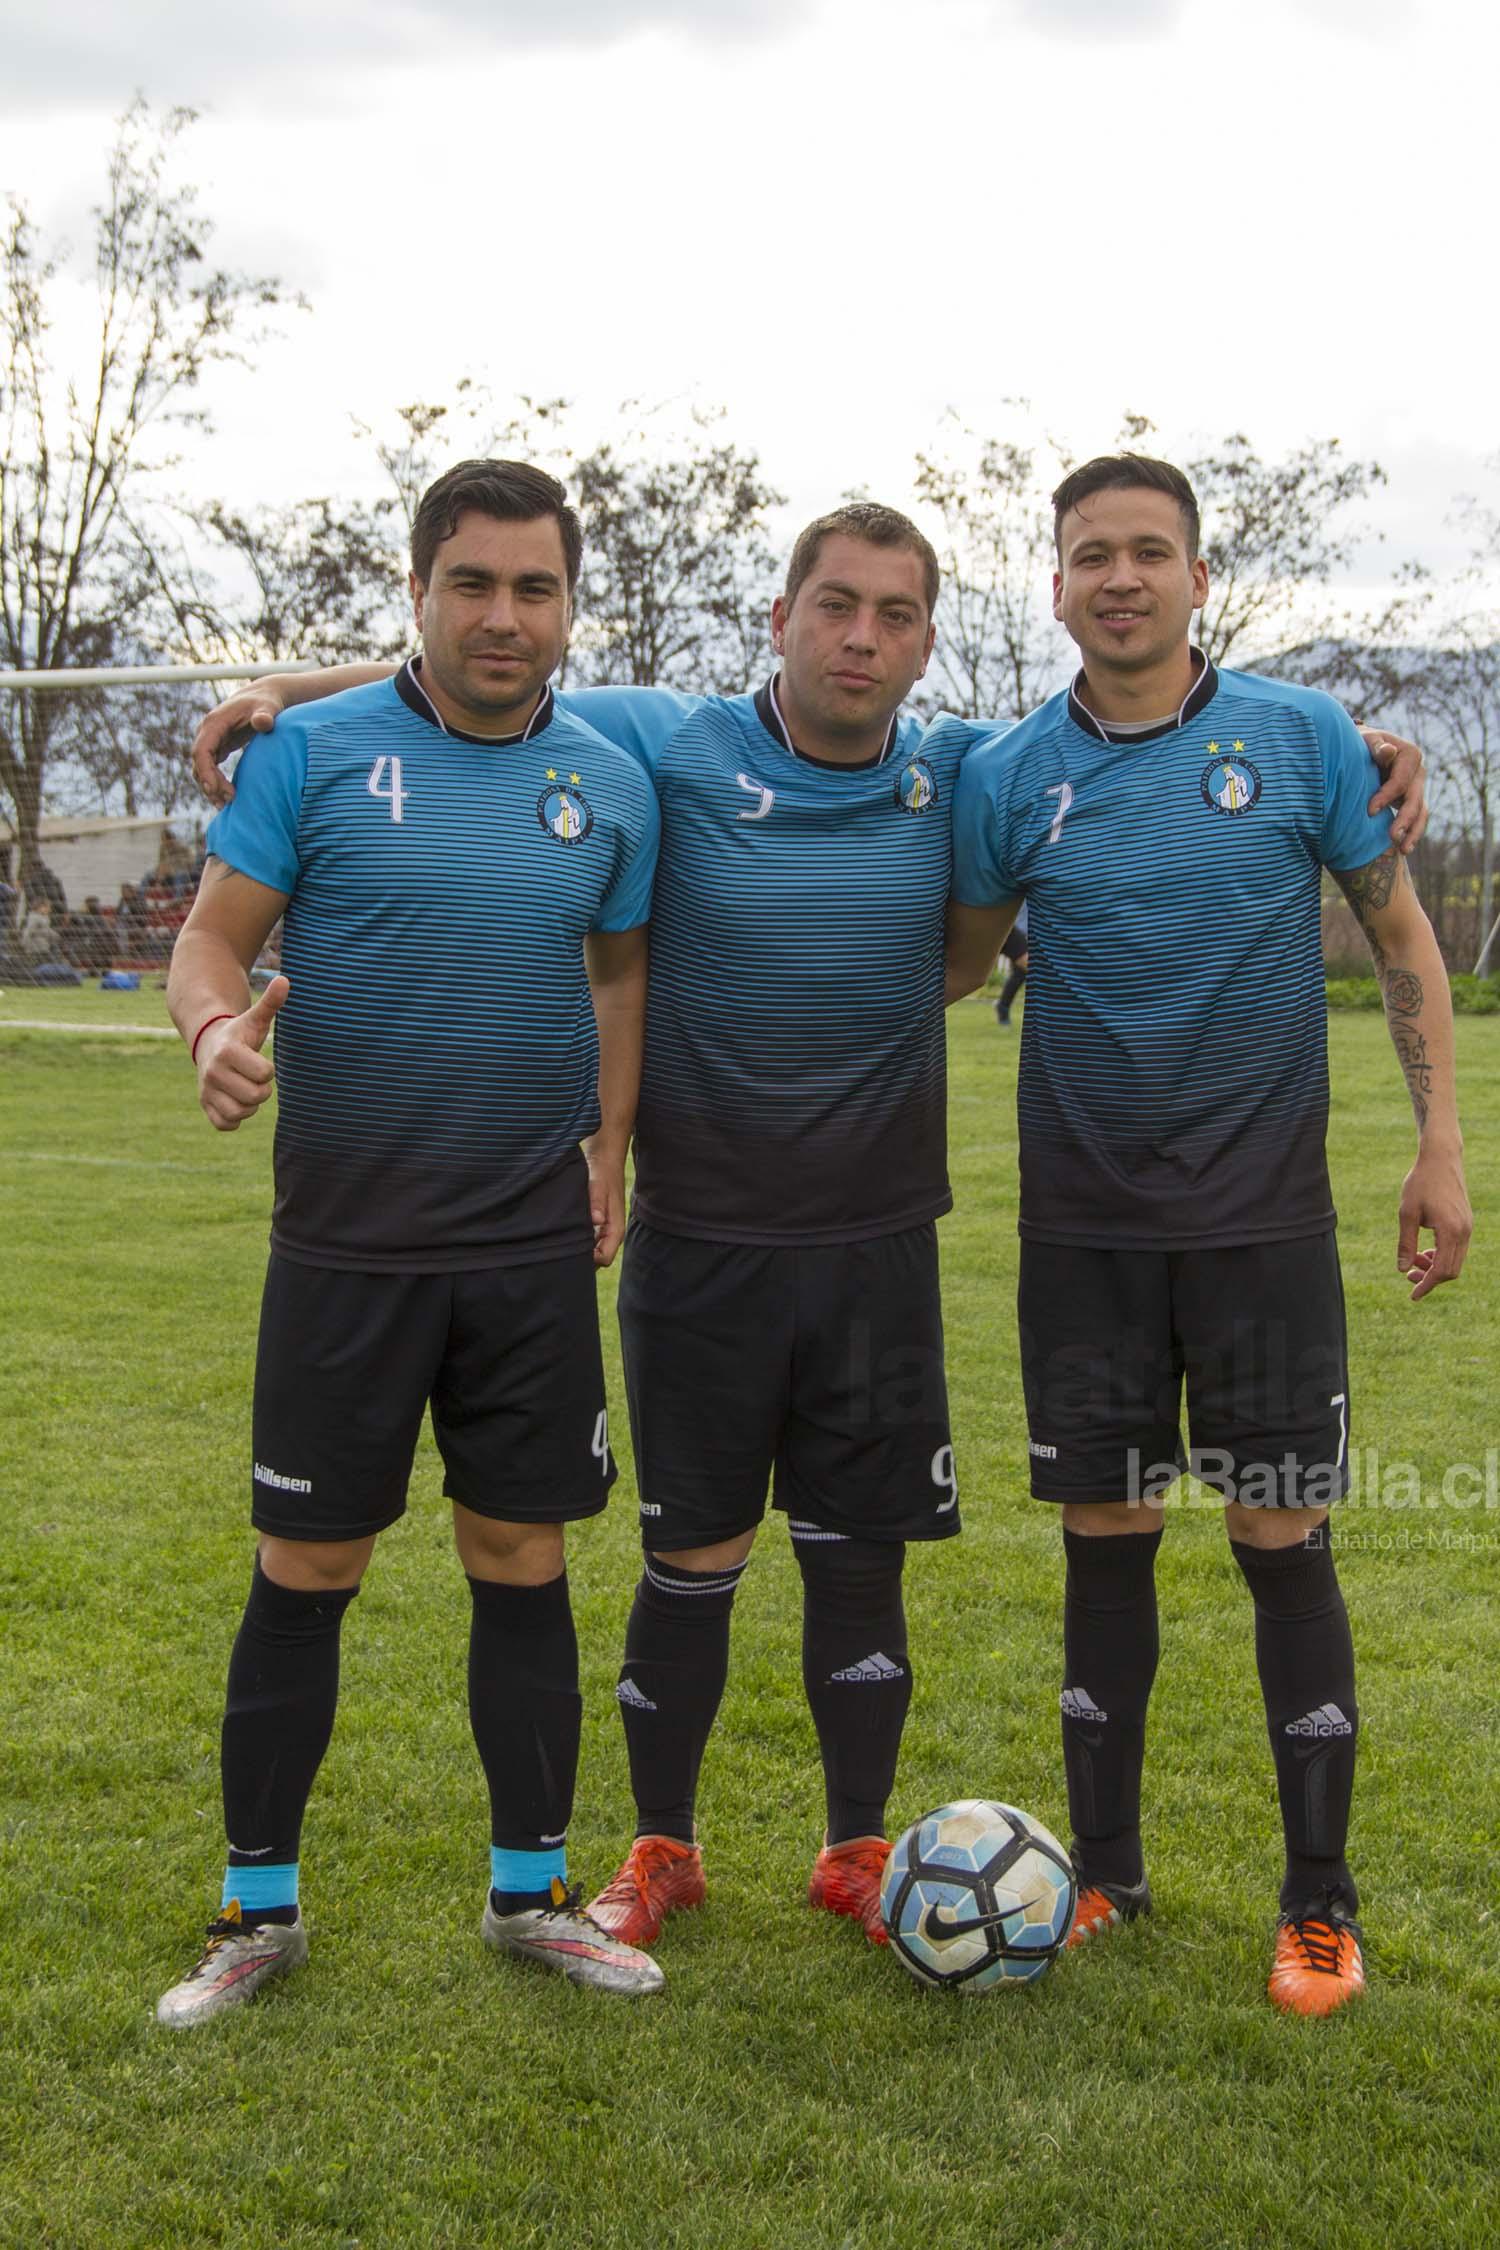 Patrona v_s Hermanos Carreras - primera adulta_1